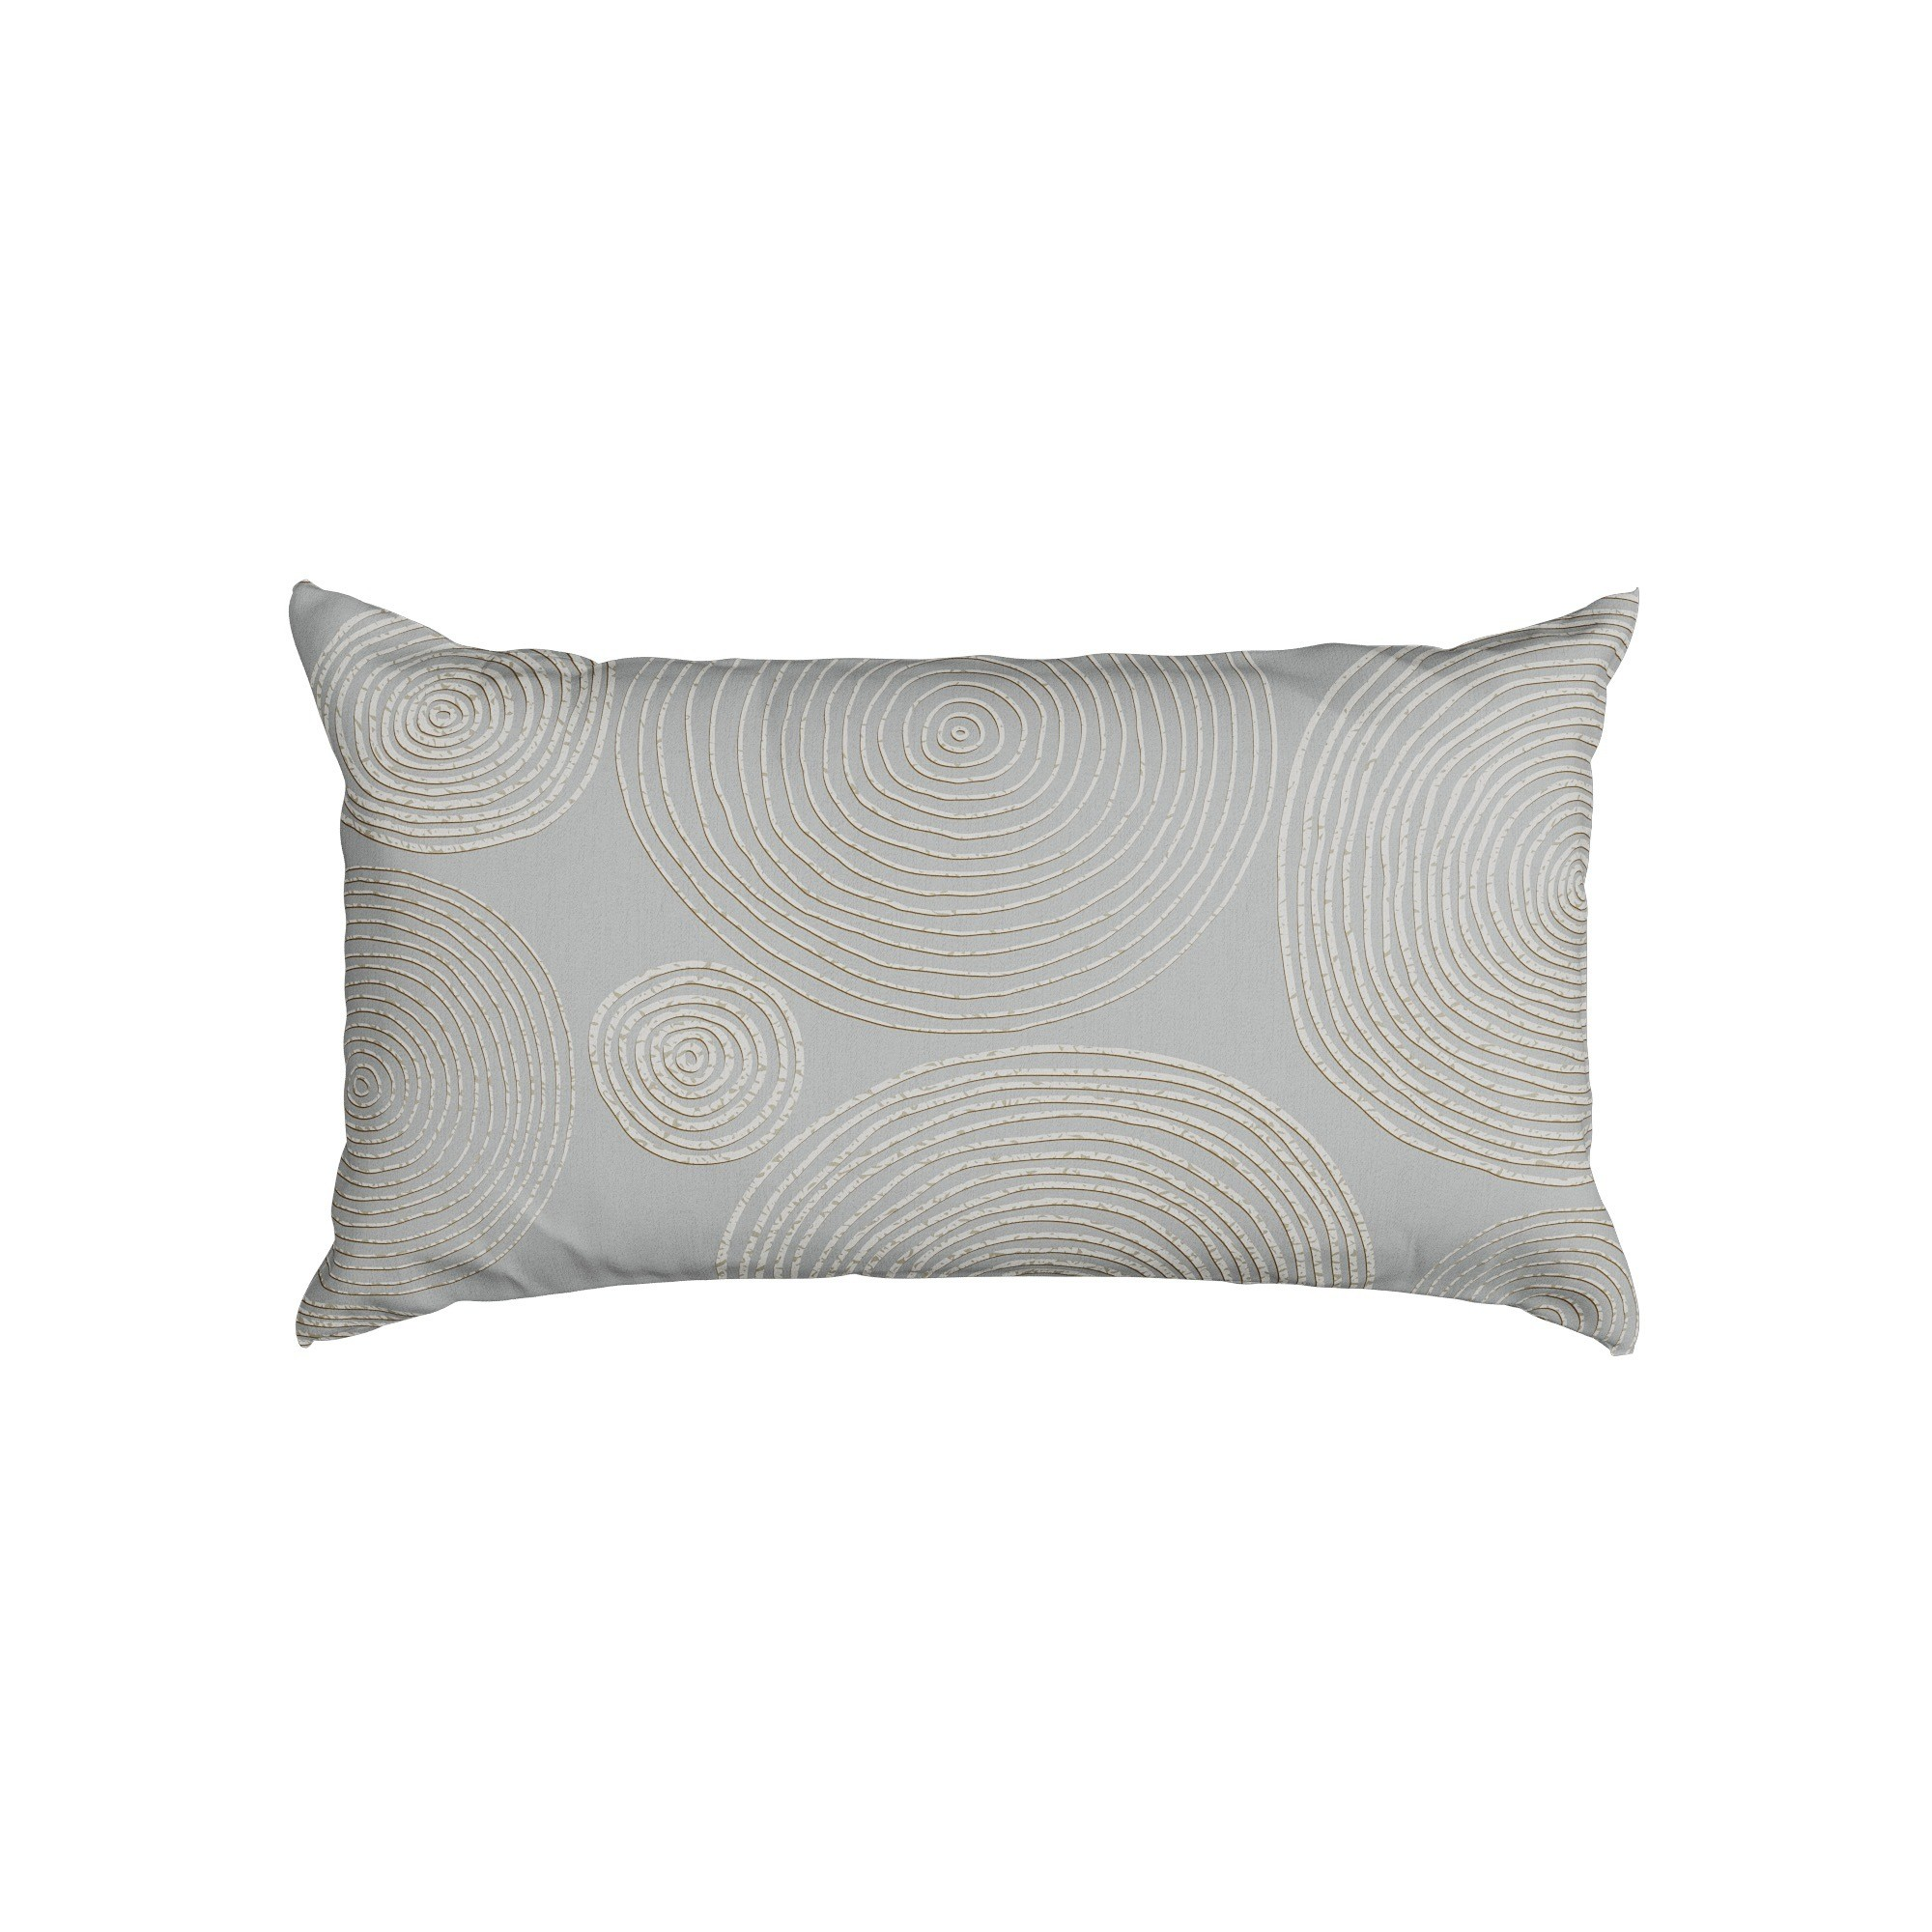 Almofada Silk Home 28x48cm 0466 - Belchior